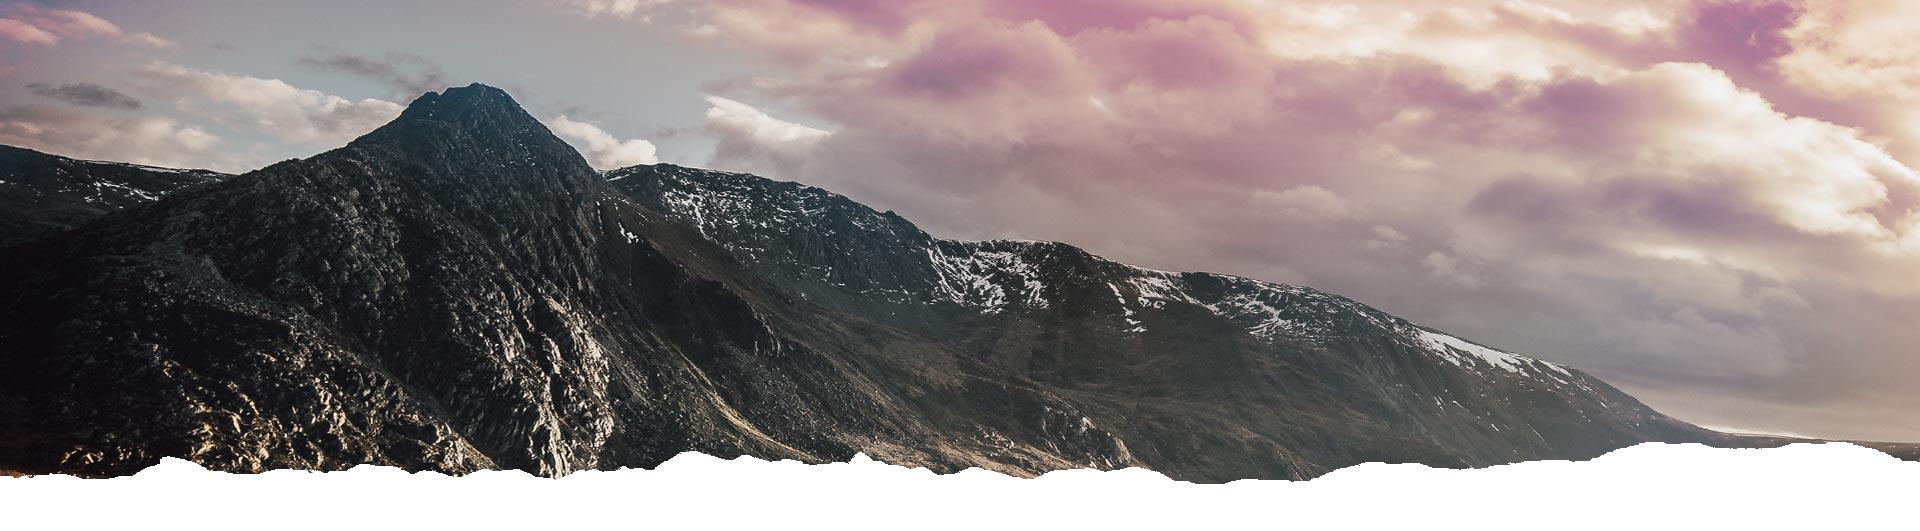 Mountain terrain with purple skys